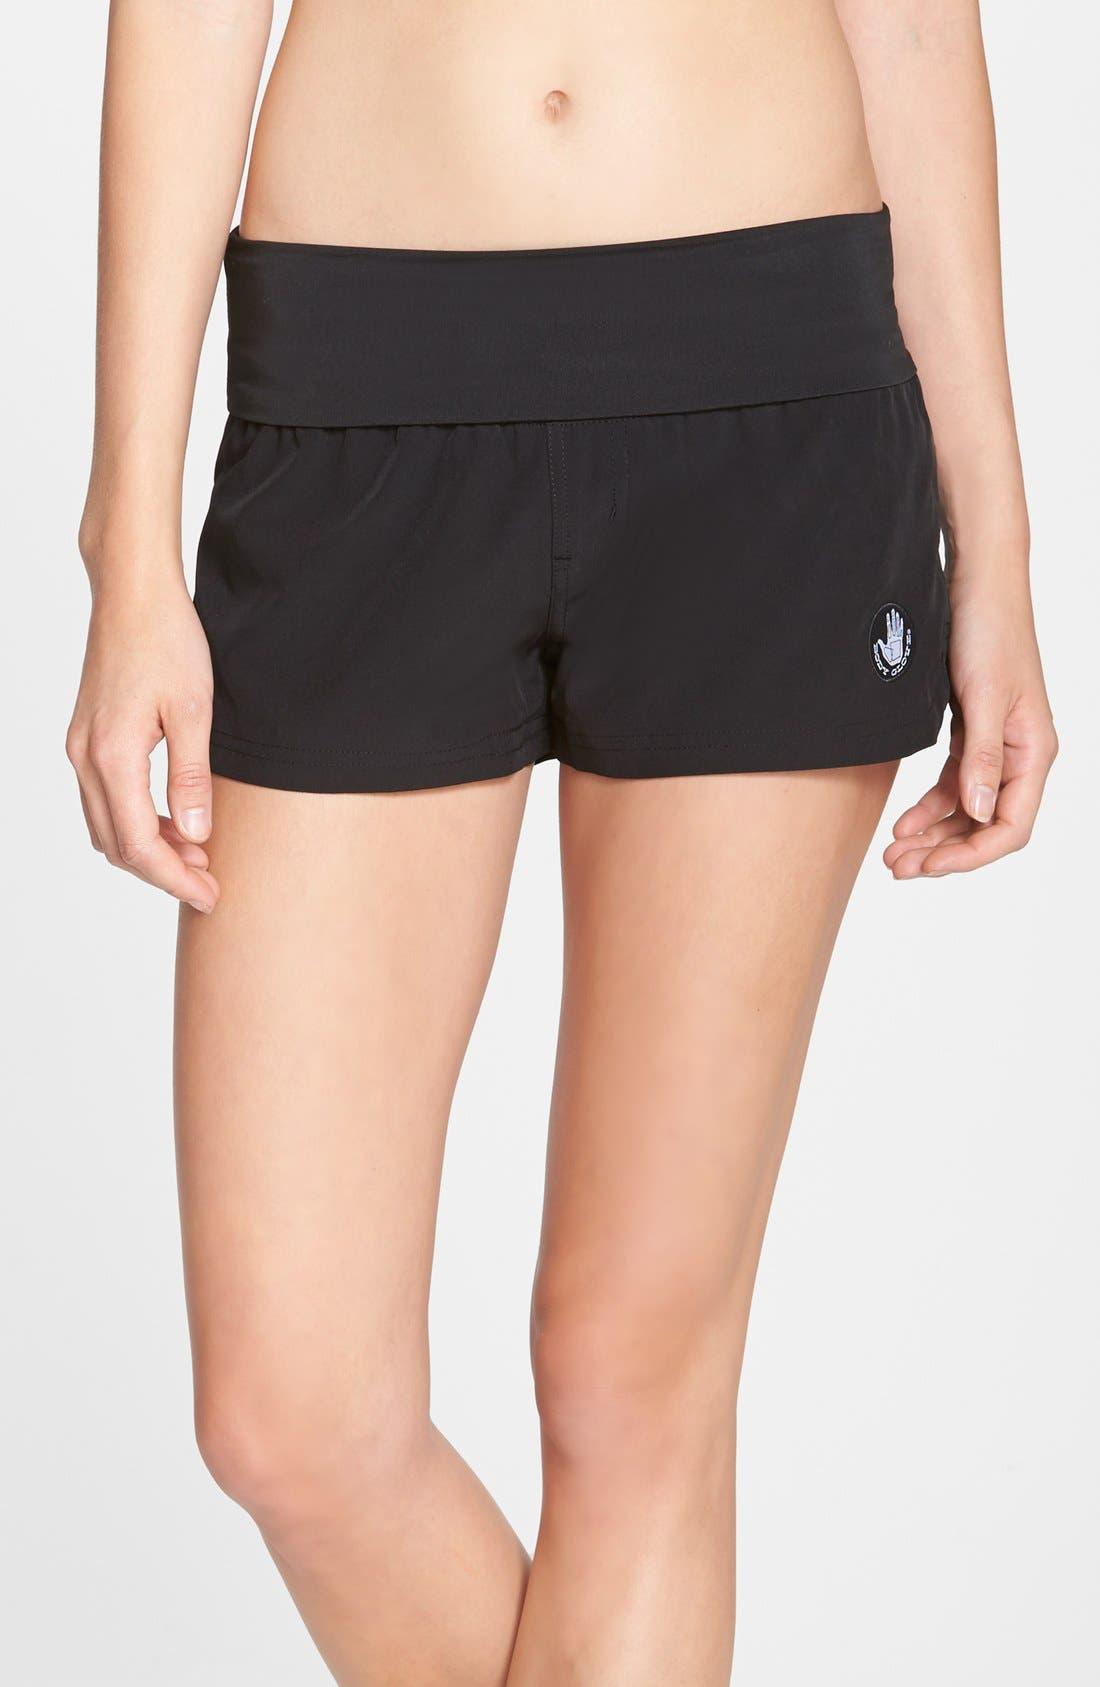 'Doheny' Water Repellent Microfiber Board Shorts,                         Main,                         color, Black